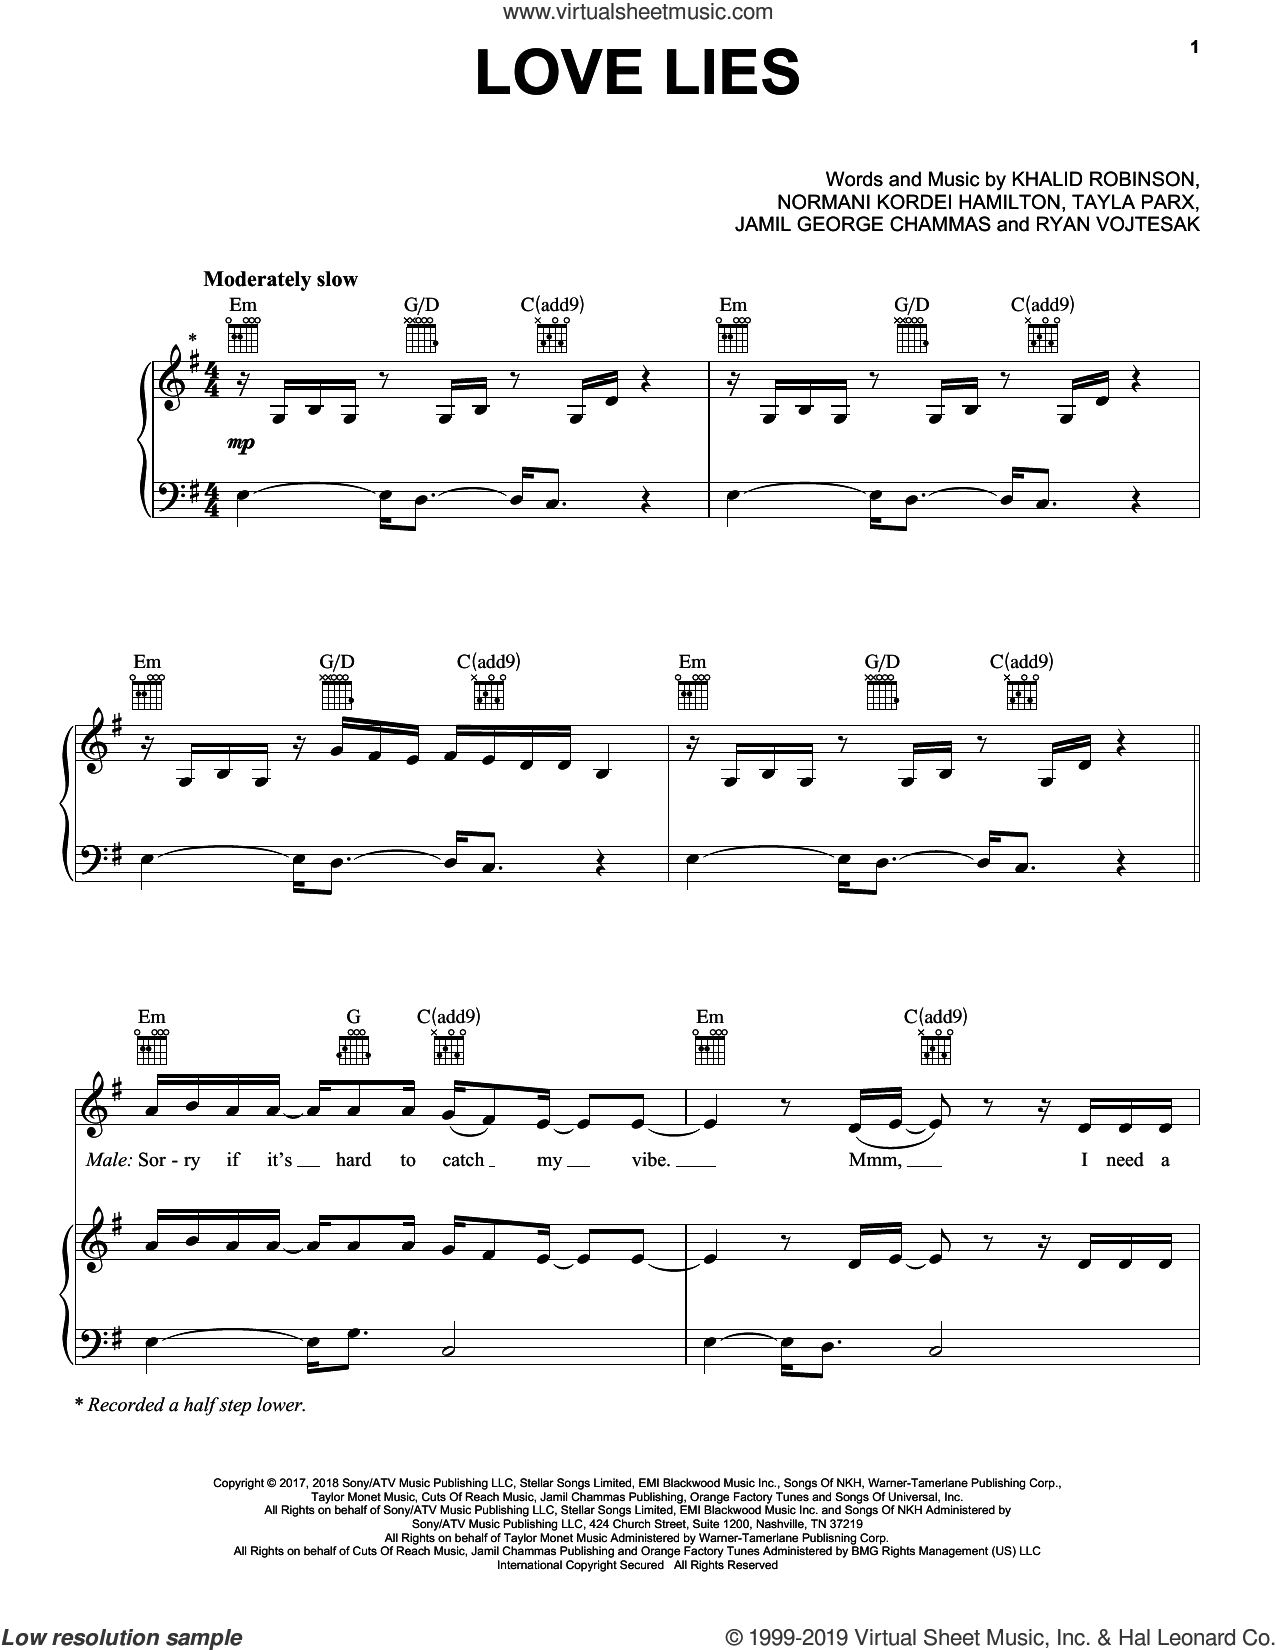 Love Lies (from Love, Simon) sheet music for voice, piano or guitar by Khalid & Normani, Khalid, Jamil George Chammas, Khalid Robinson, Normani Kordei Hamilton, Ryan Vojtesak and Tayla Parx, intermediate skill level